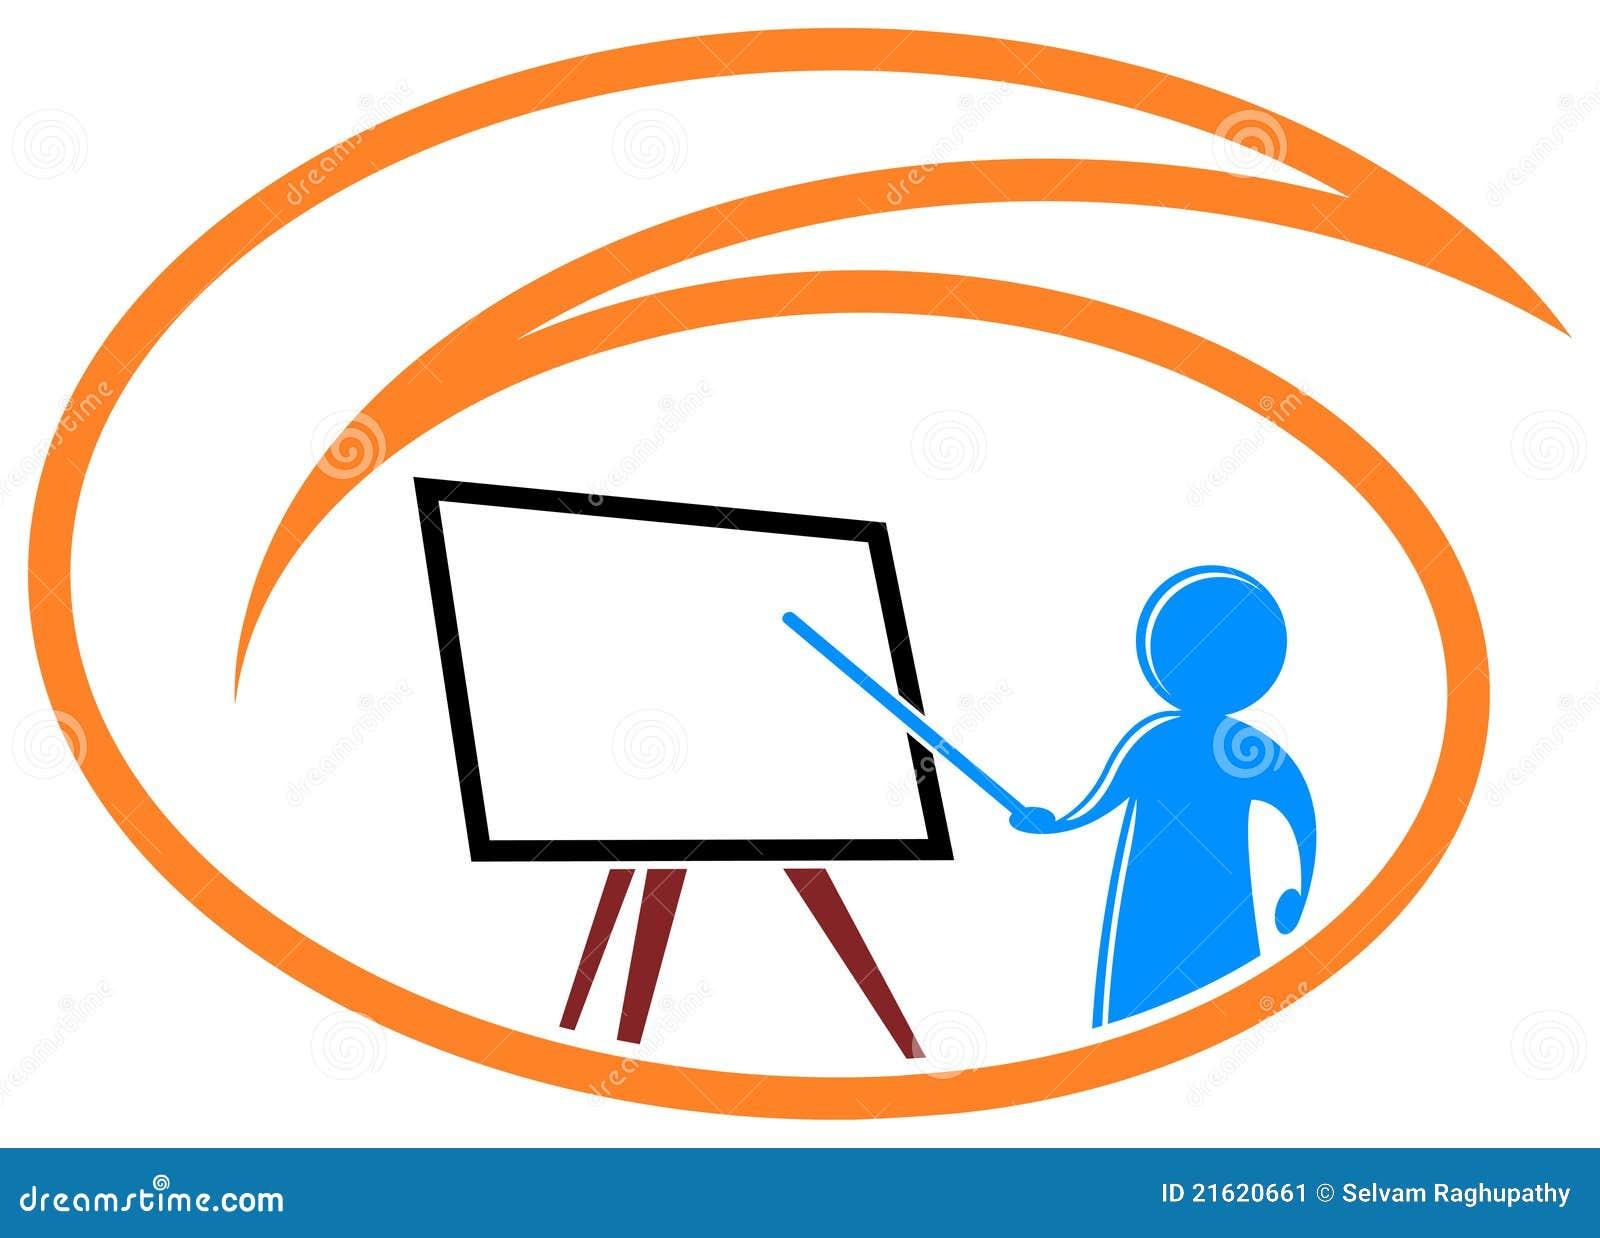 Classroom Logo Design ~ Teaching logo stock vector illustration of lecture